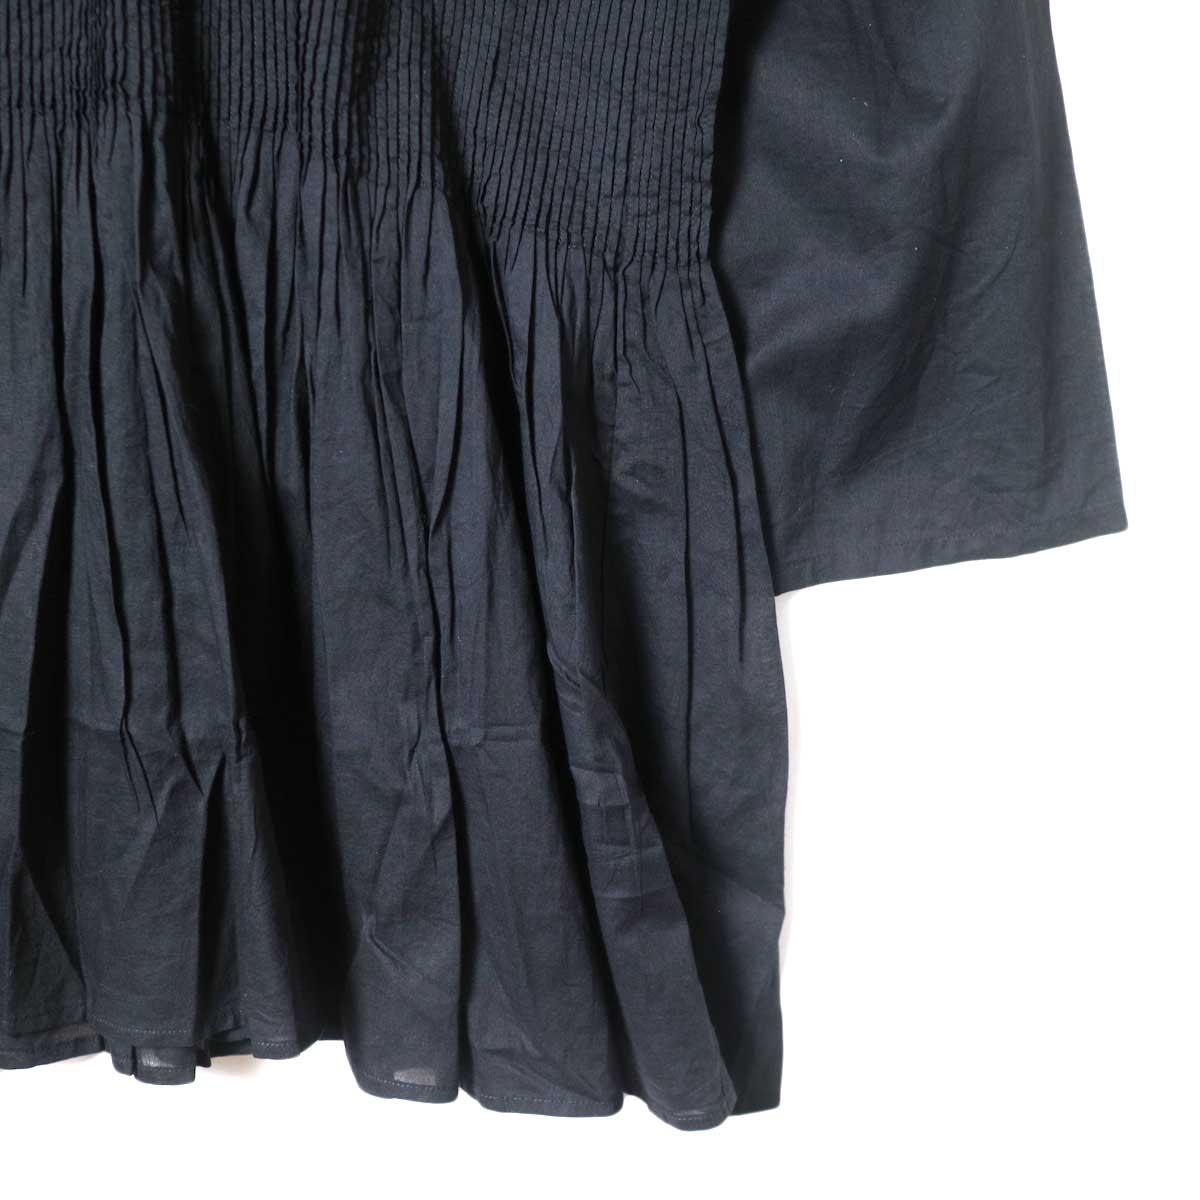 maison de soil / BACK OPENING STAND COLLAR SHIRT WITH MINI PINTUCK (Black) 袖・裾